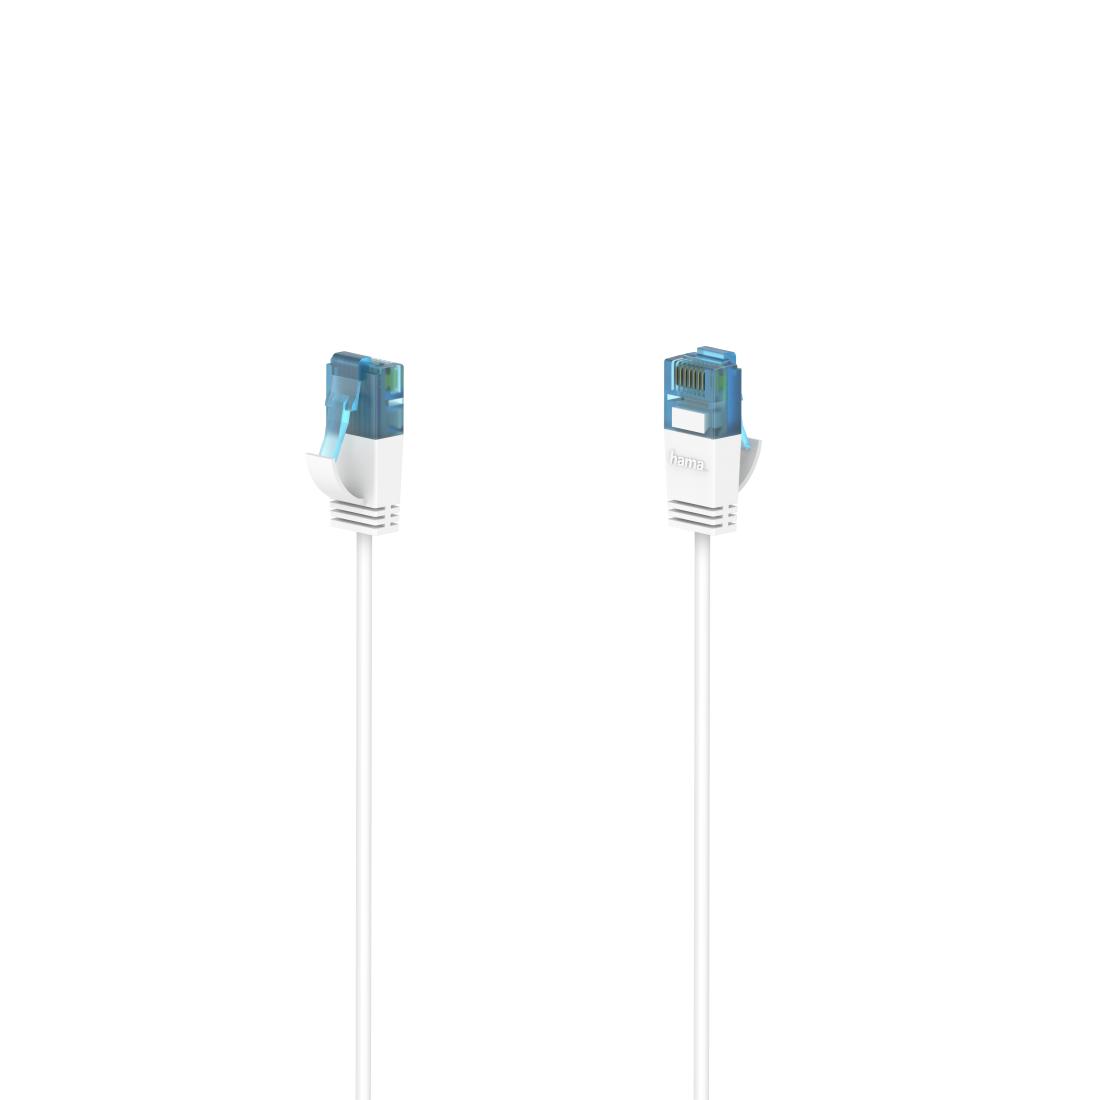 Мрежов кабел HAMA Flexi-Slim, U/UTP CAT 6a, 10 Gbit/s, RJ-45 - RJ45, 0.75 m, Бял